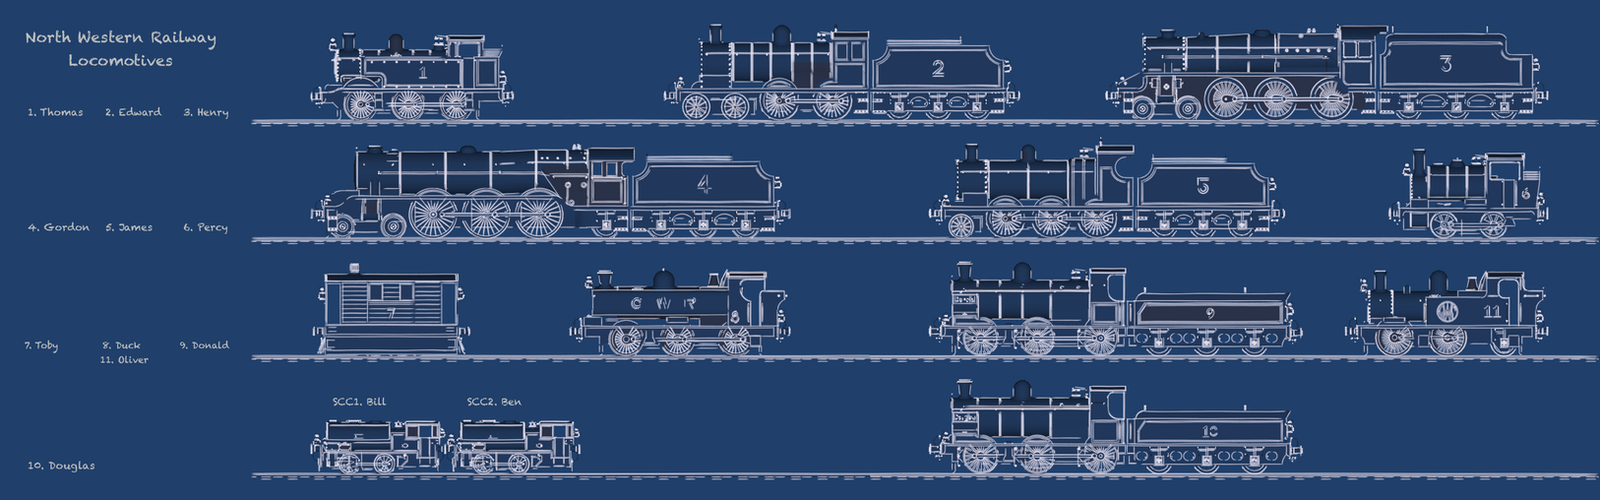 Nwr steam locomotives blueprint by the arc minister on deviantart nwr steam locomotives blueprint by the arc minister malvernweather Gallery